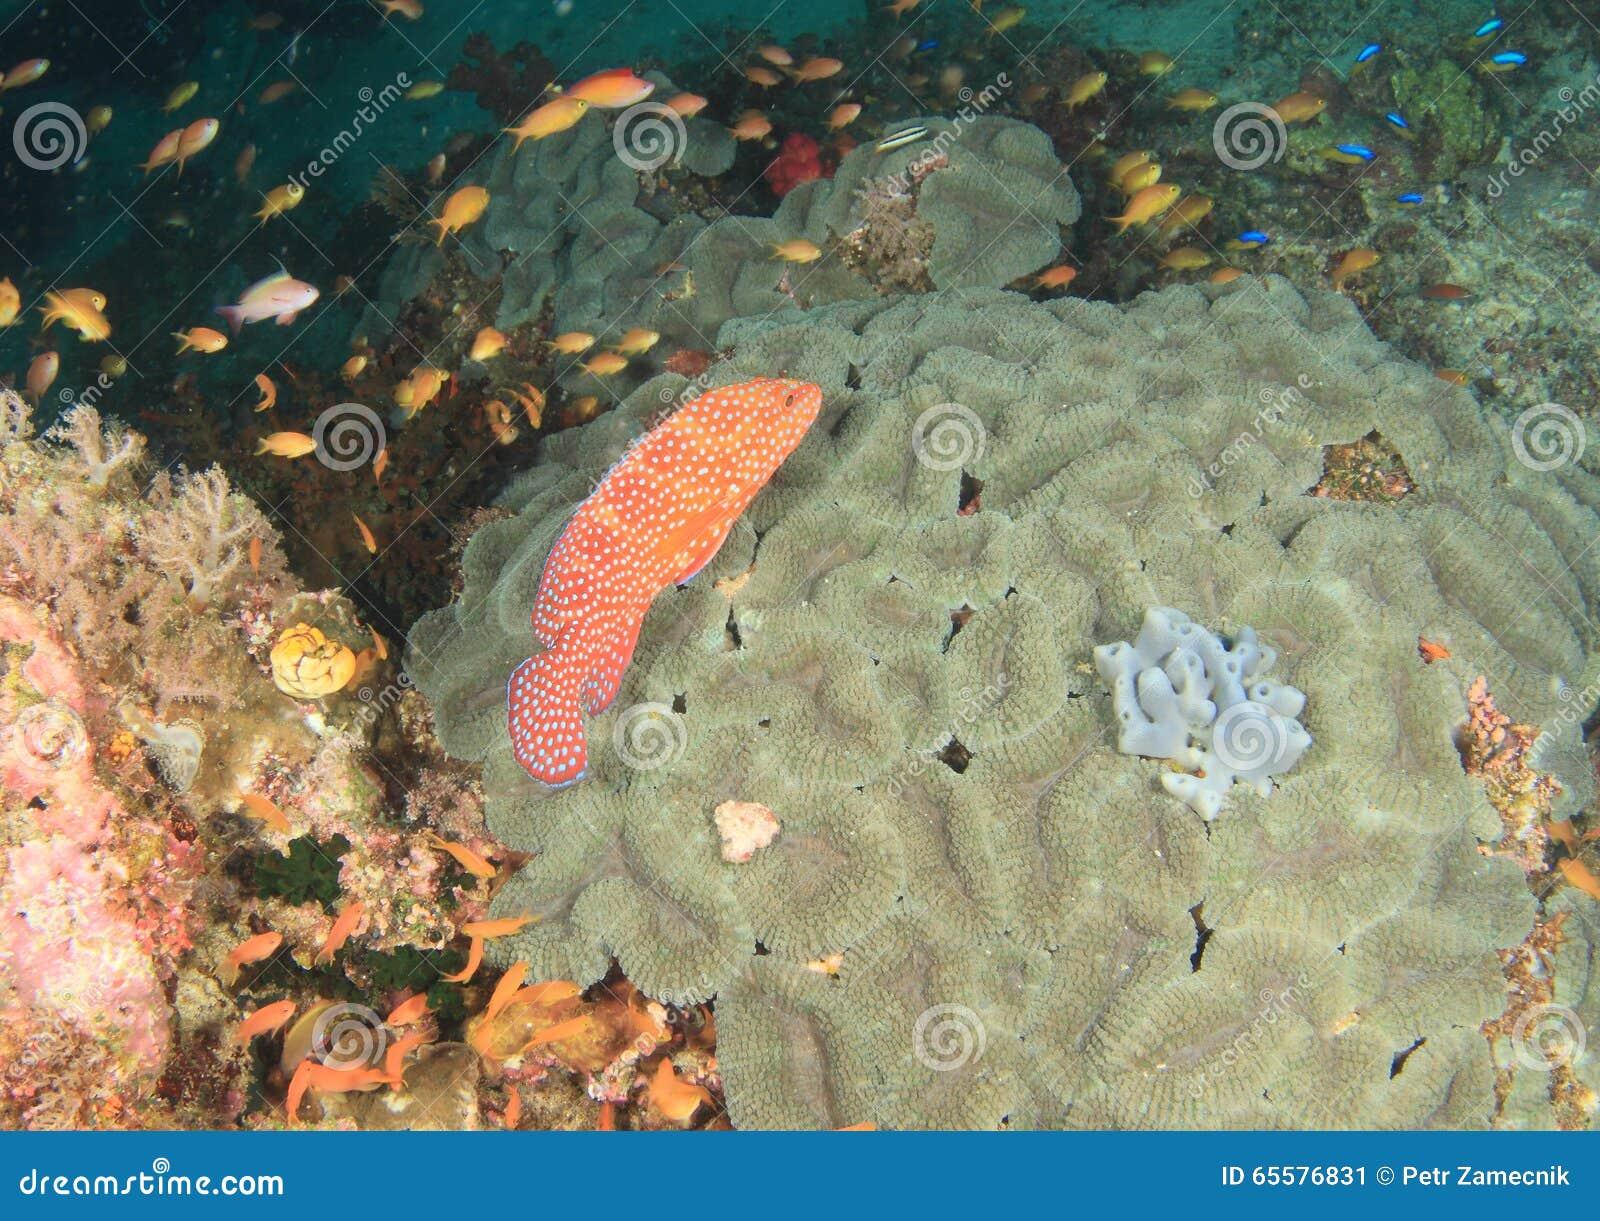 Garoupa coral